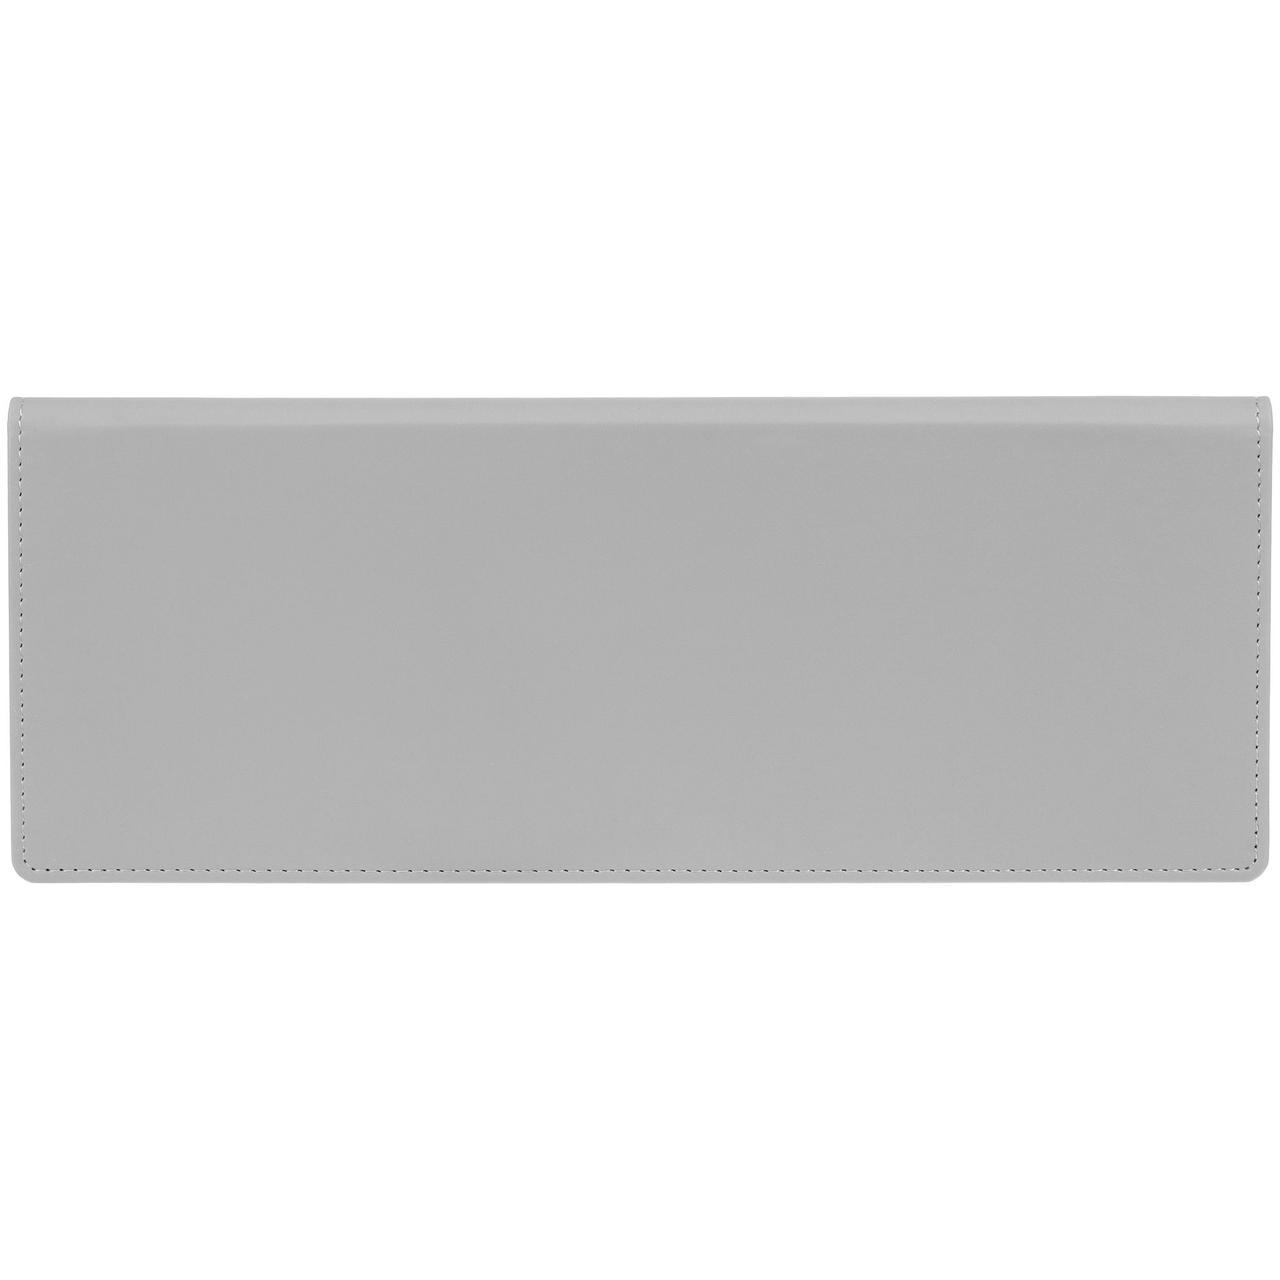 Планинг Shall, датированный, серый (артикул 16117.10)